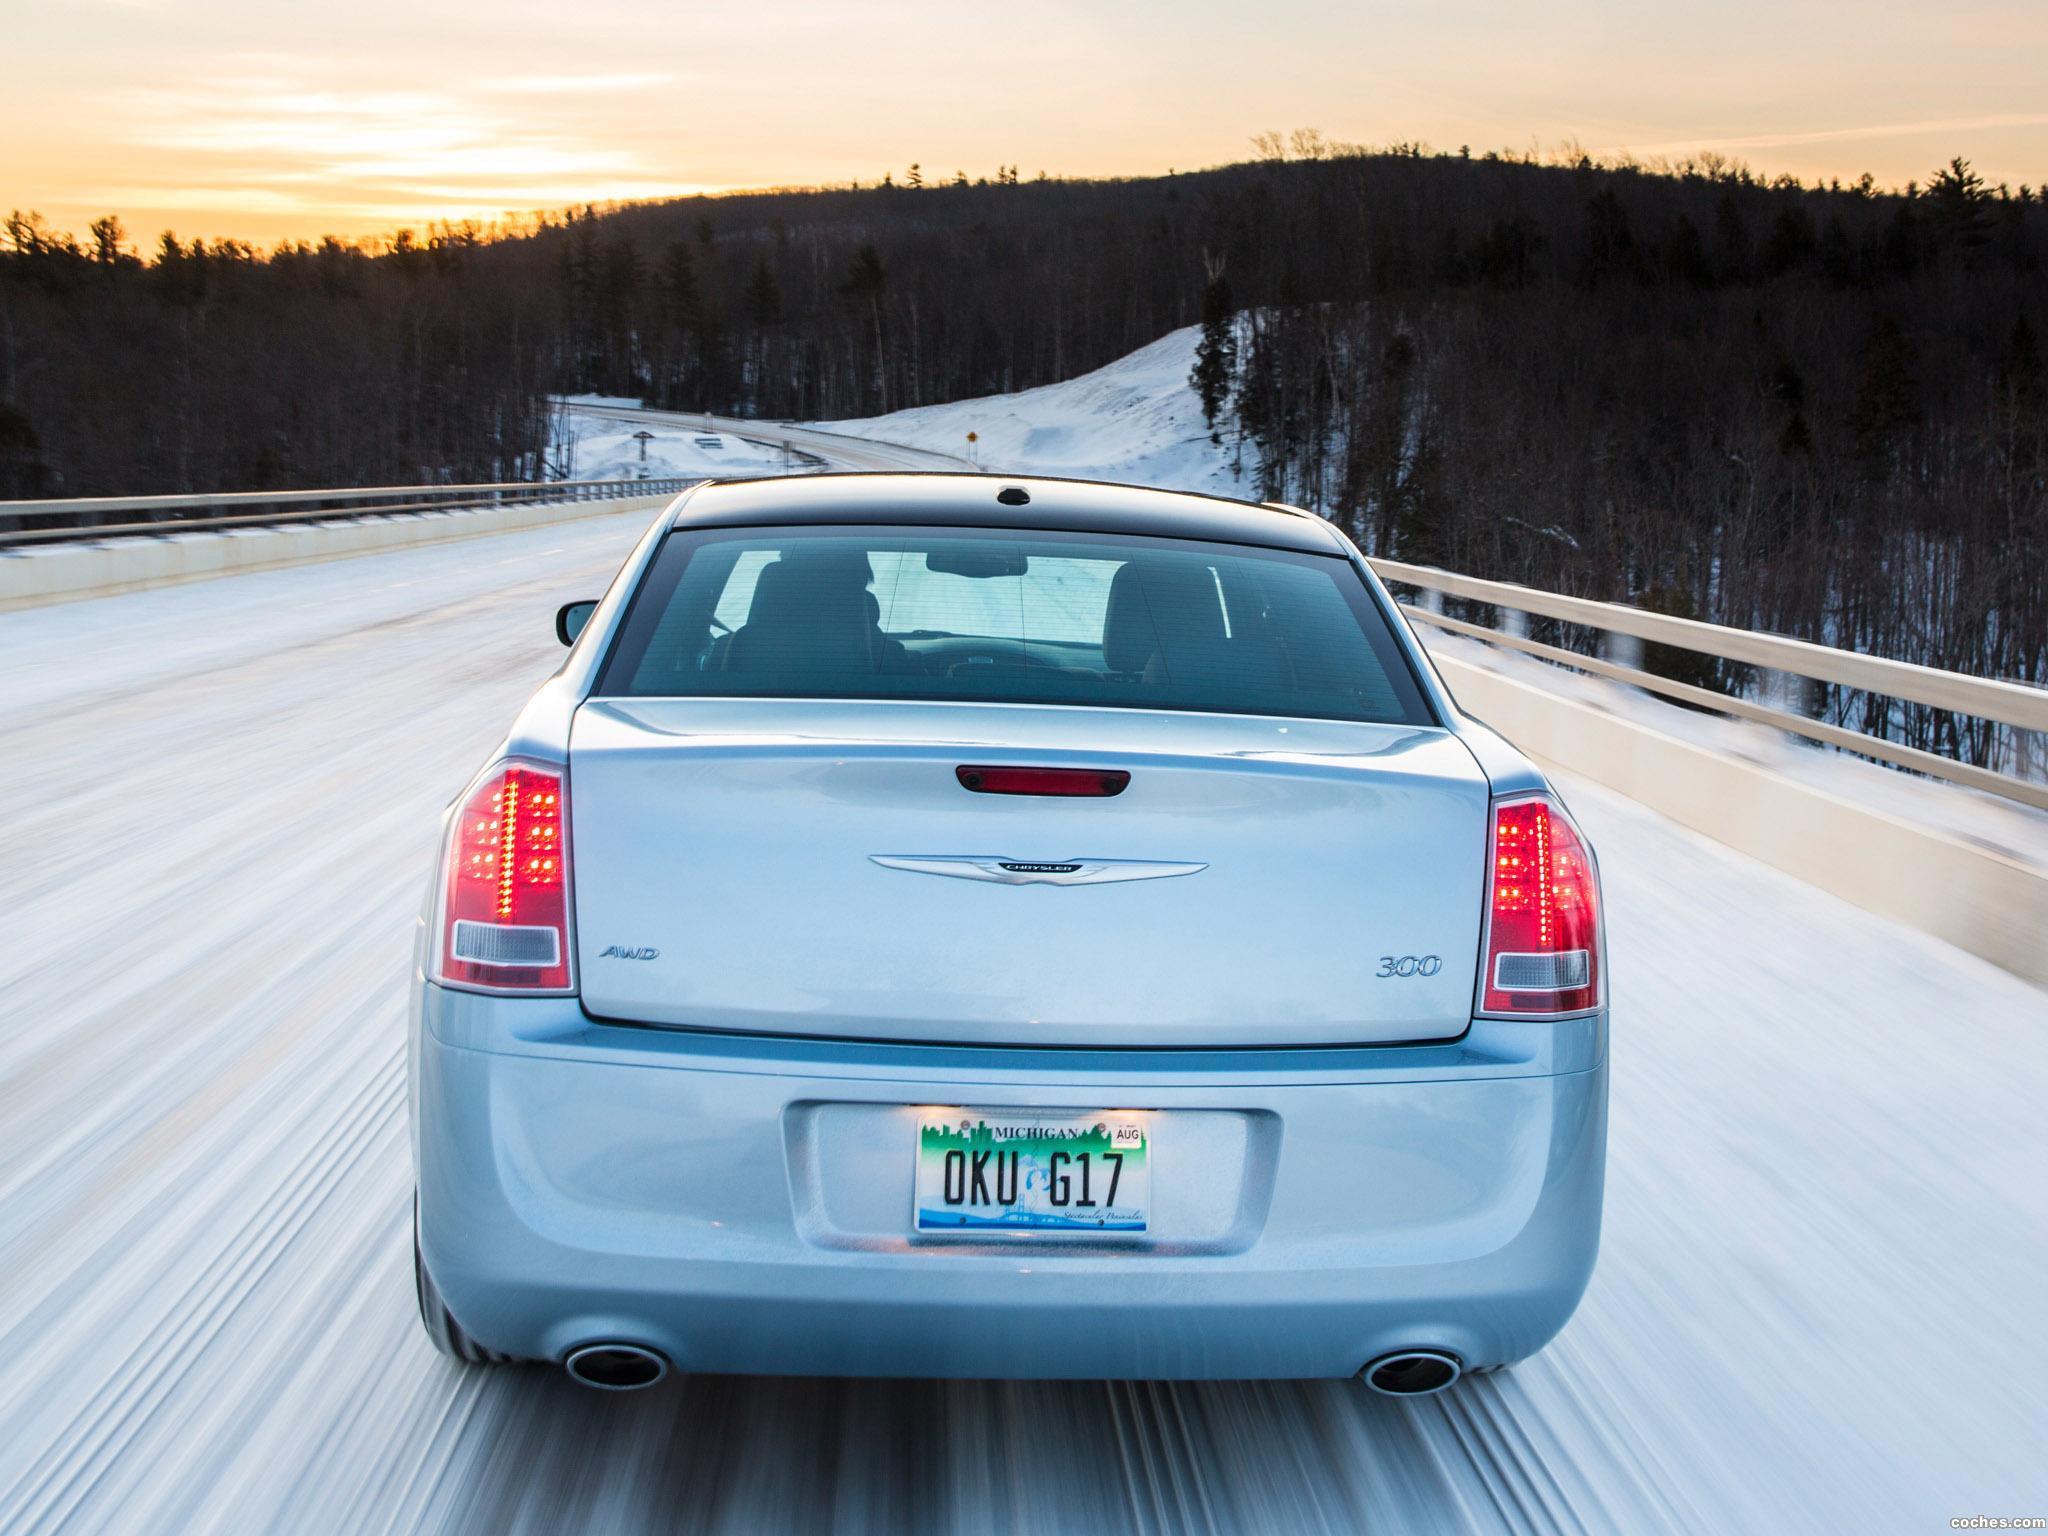 Foto 8 de Chrysler 300 Glacier 2013